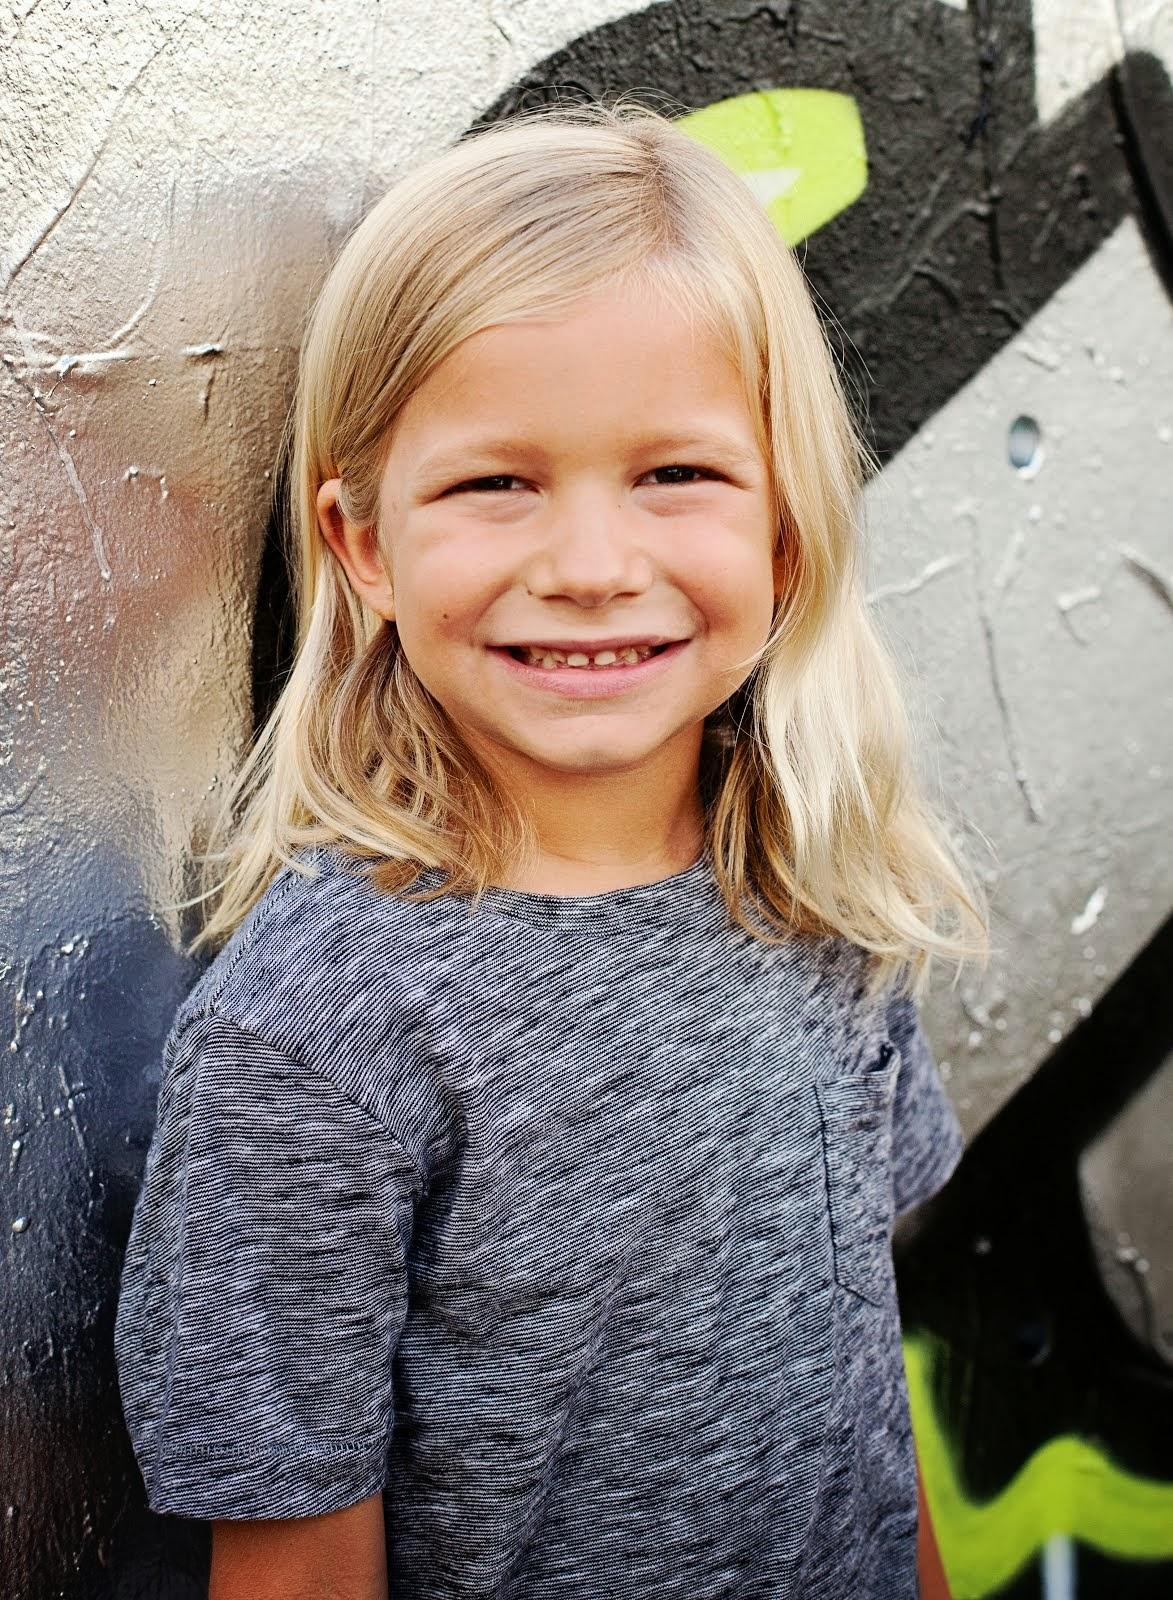 Logan- age 6